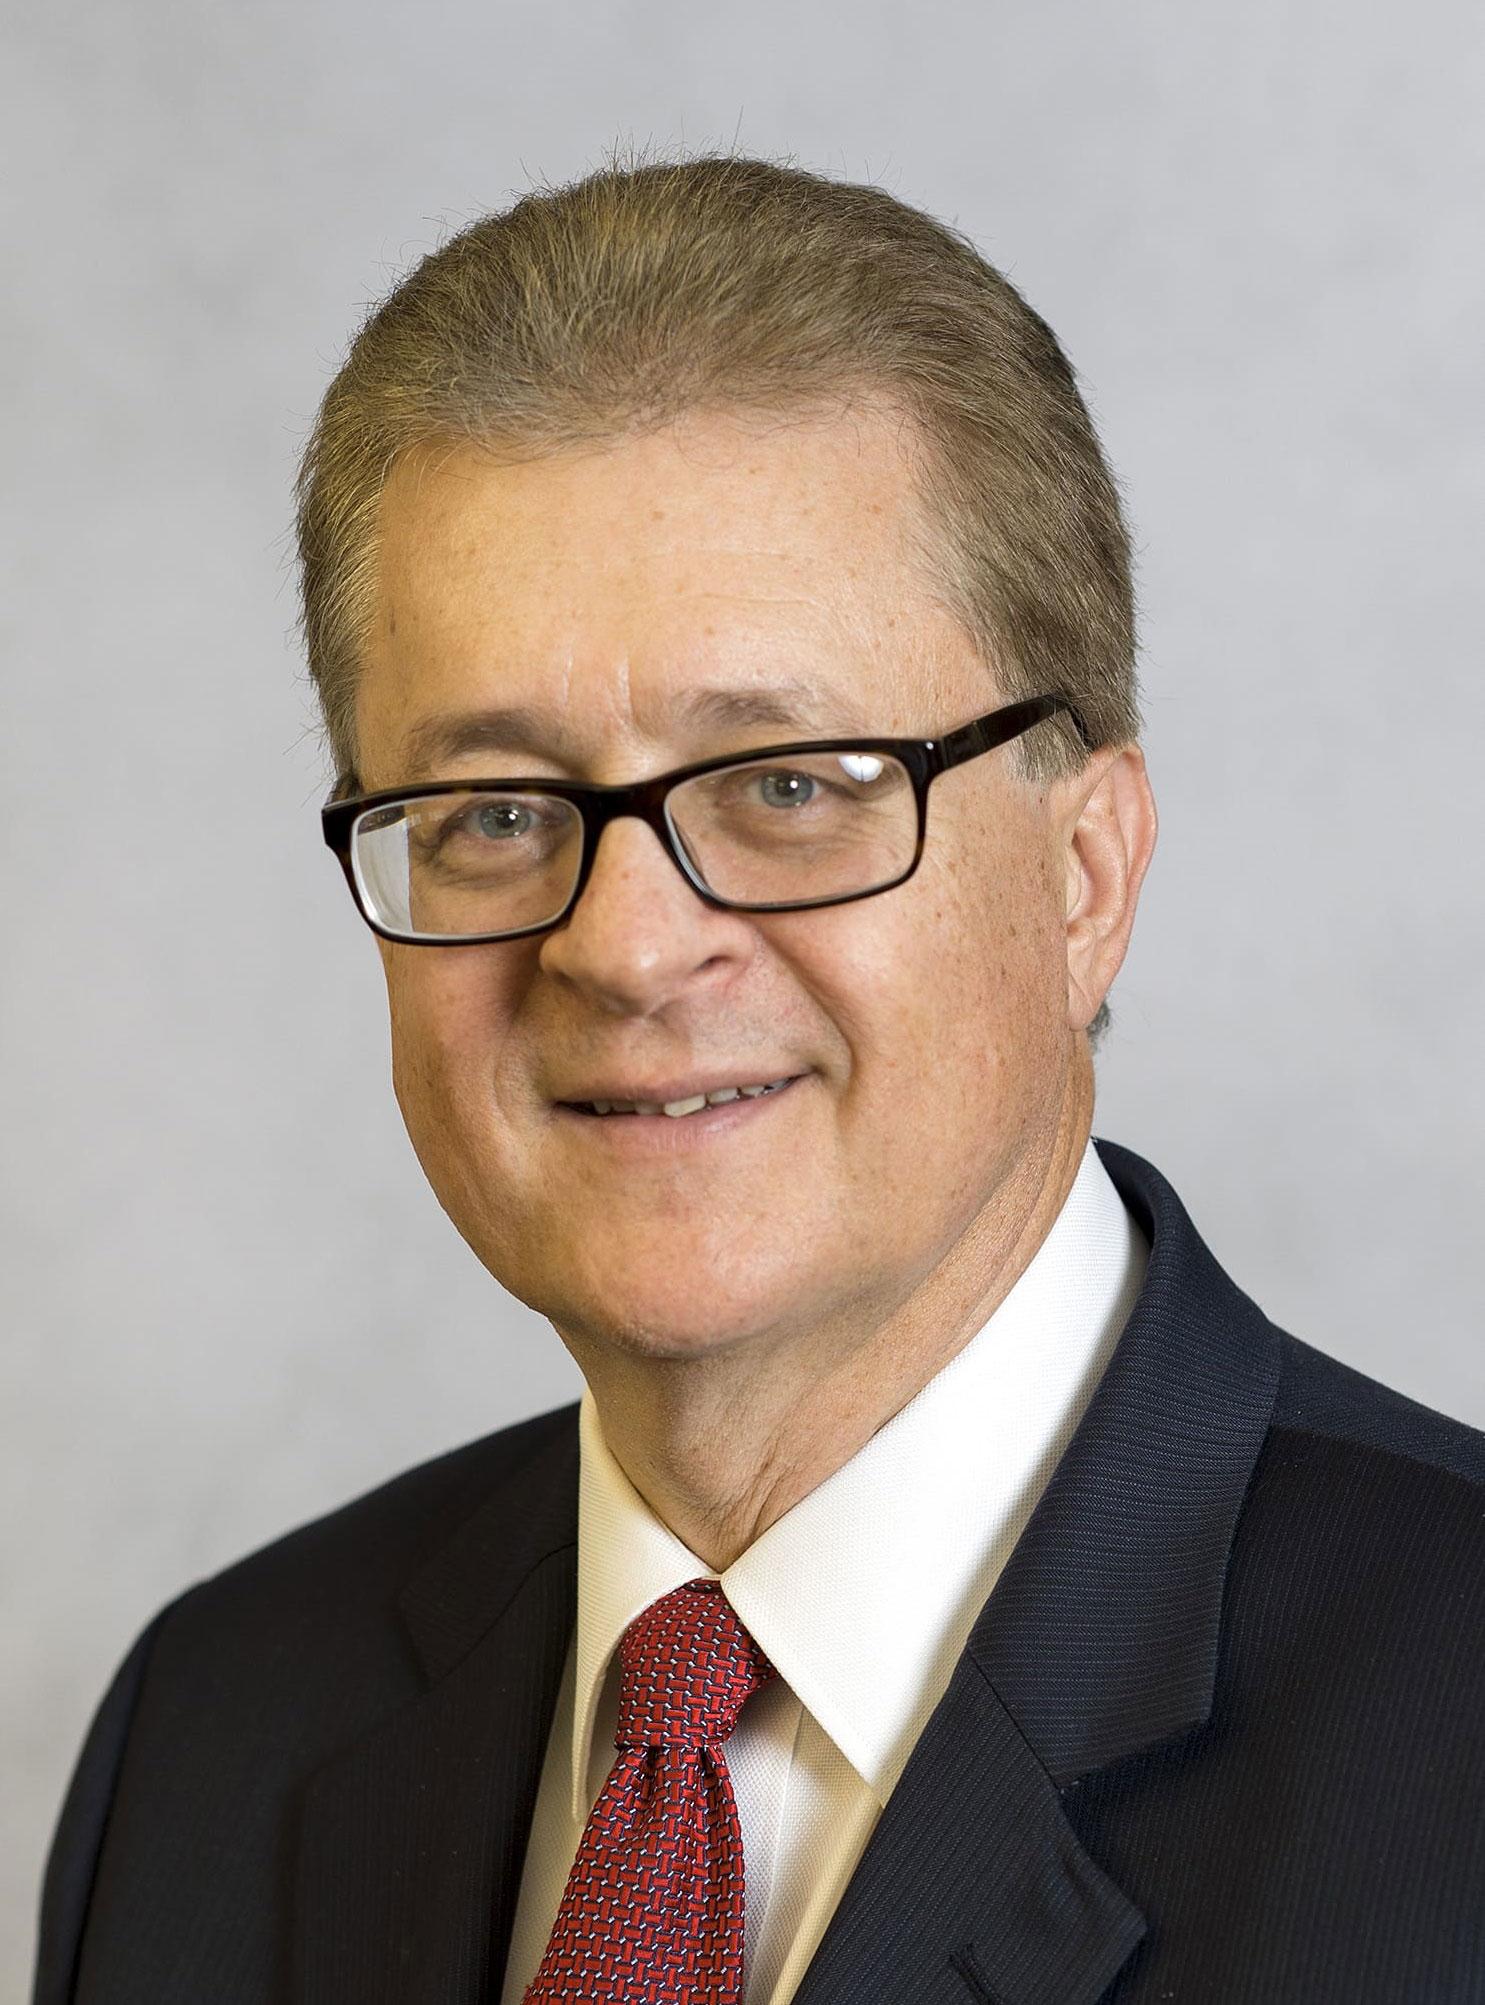 Dr. Gregory Rokosz